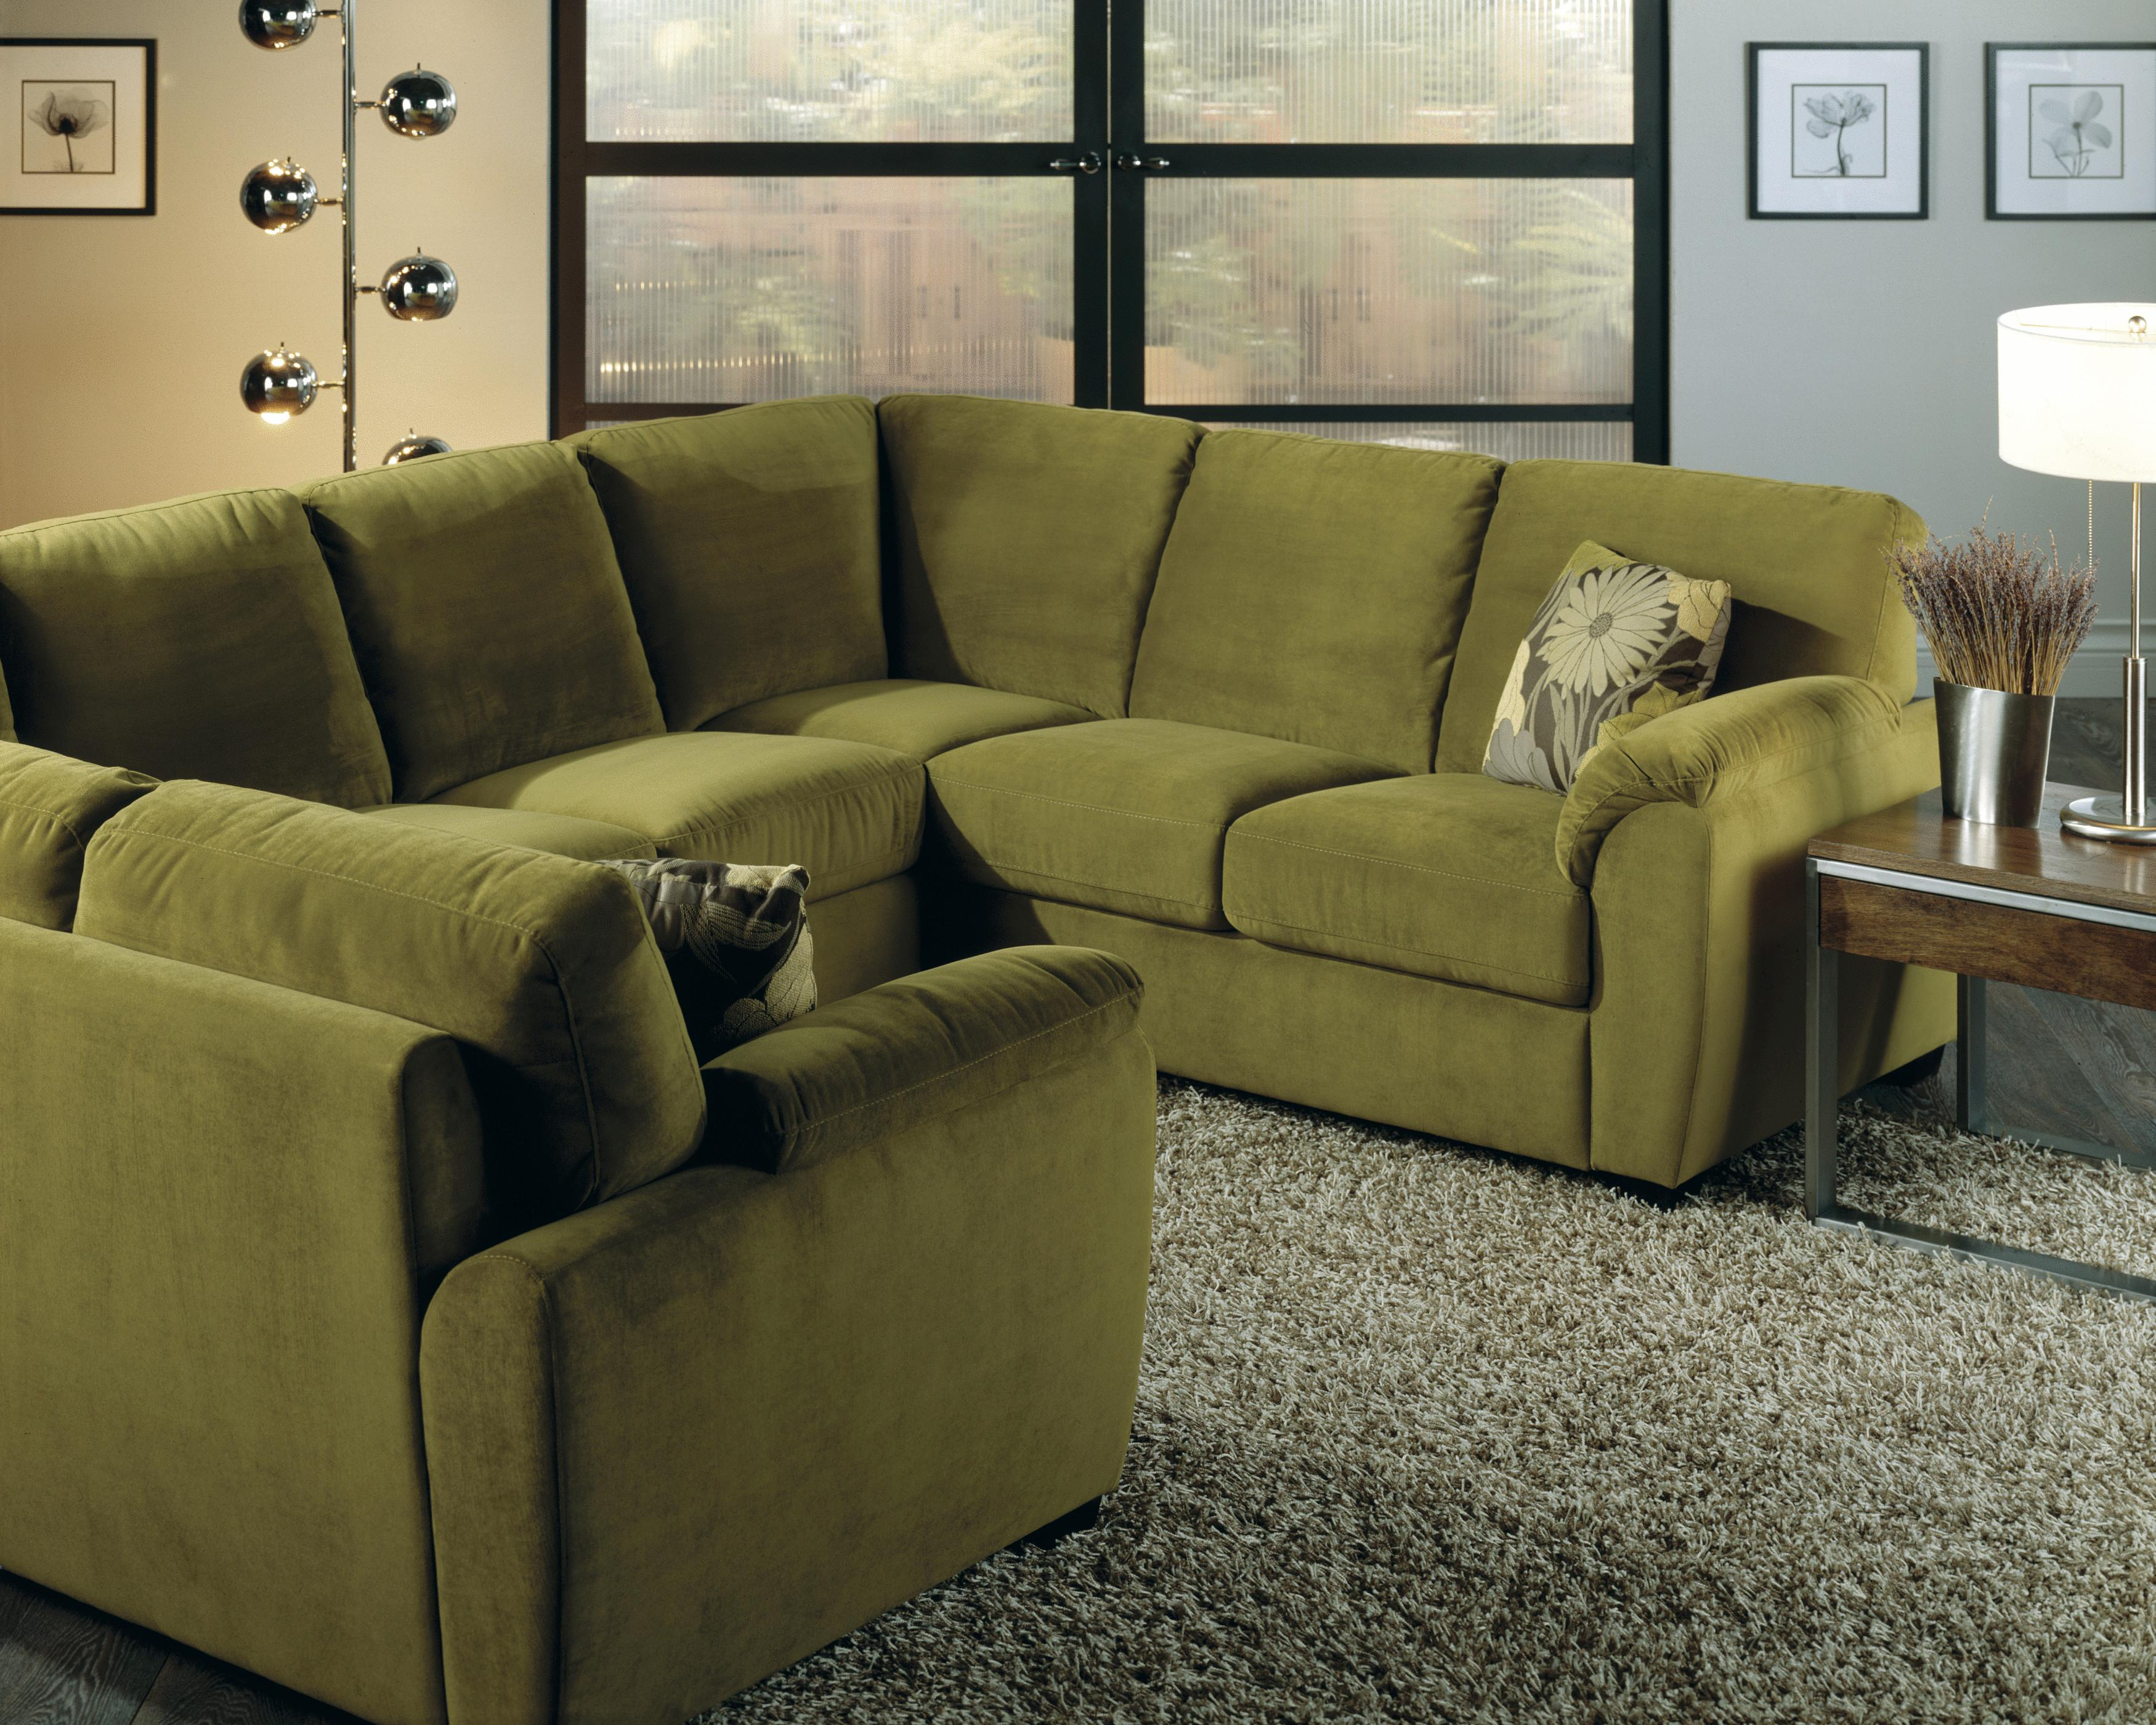 Palliser Lanza Casual Square Sectional Sofa A1 Furniture